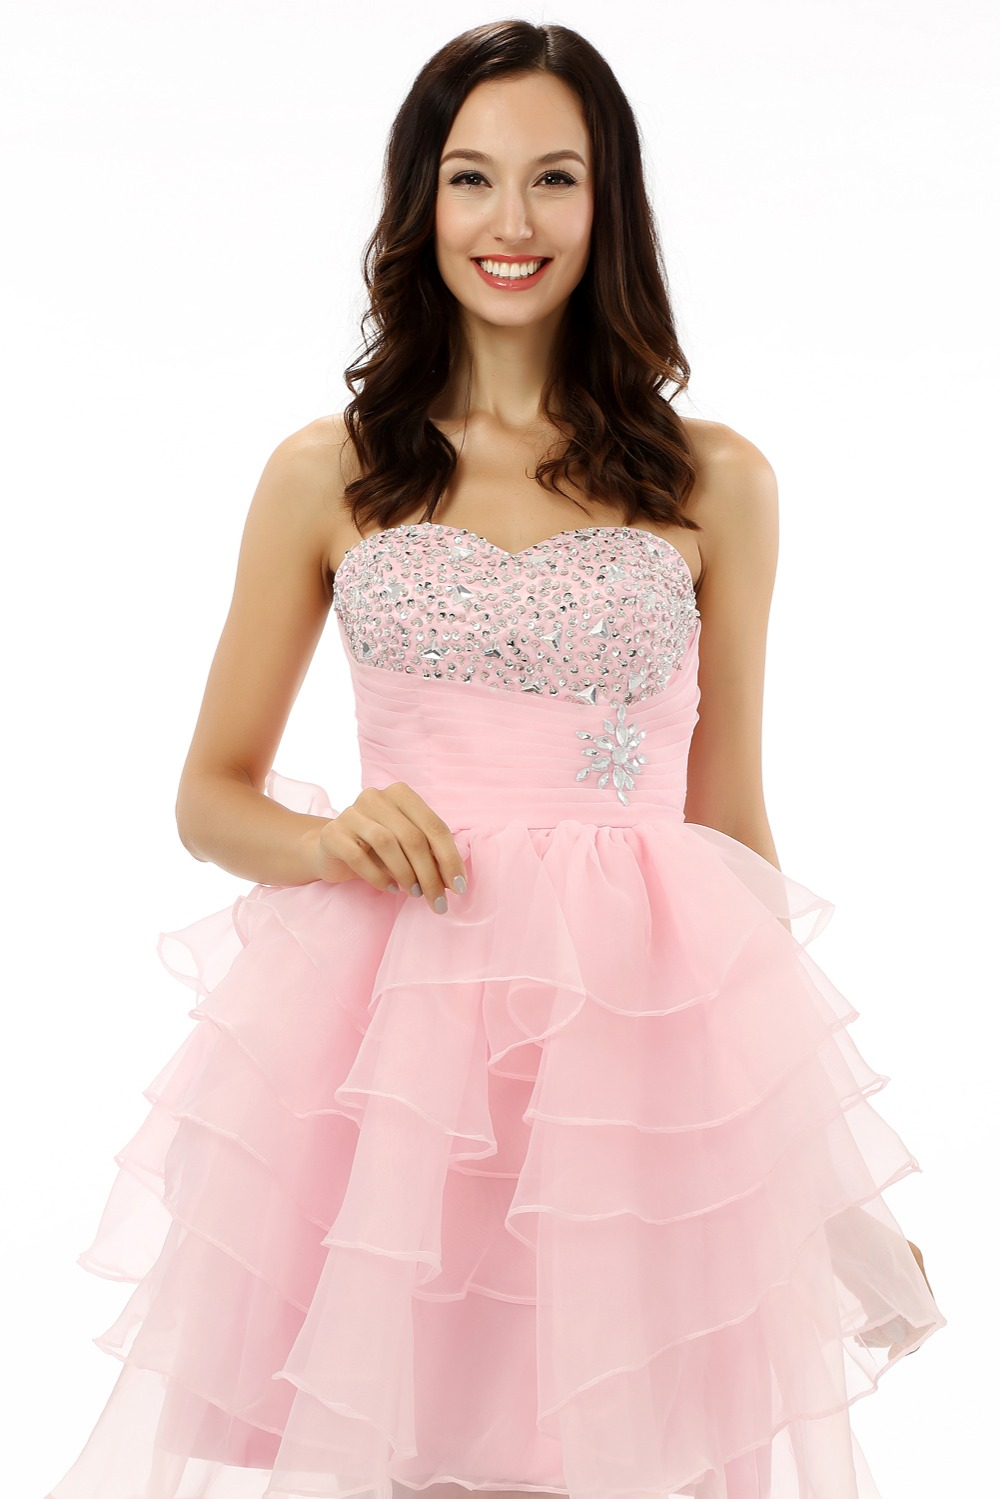 Vistoso Vestidos Con Gradas Para La Madre De La Novia Modelo ...